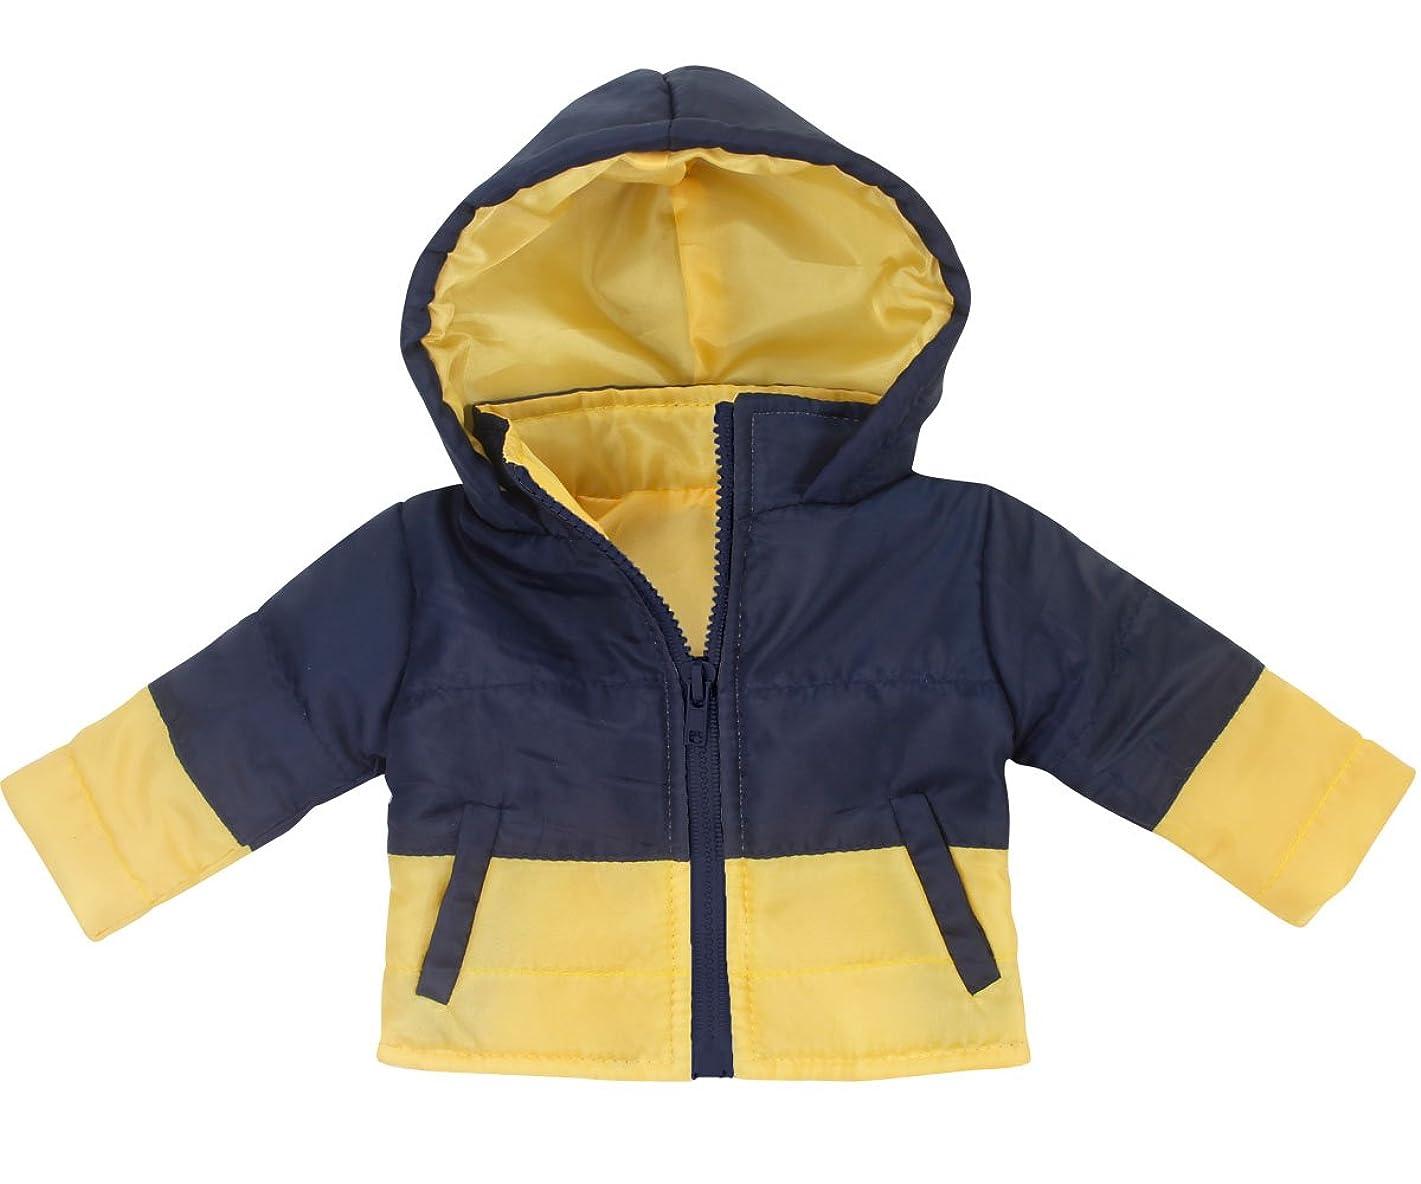 18 Inch Boy Doll Coat by Sophia's | Navy & Yellow Puffy Coat for Dolls